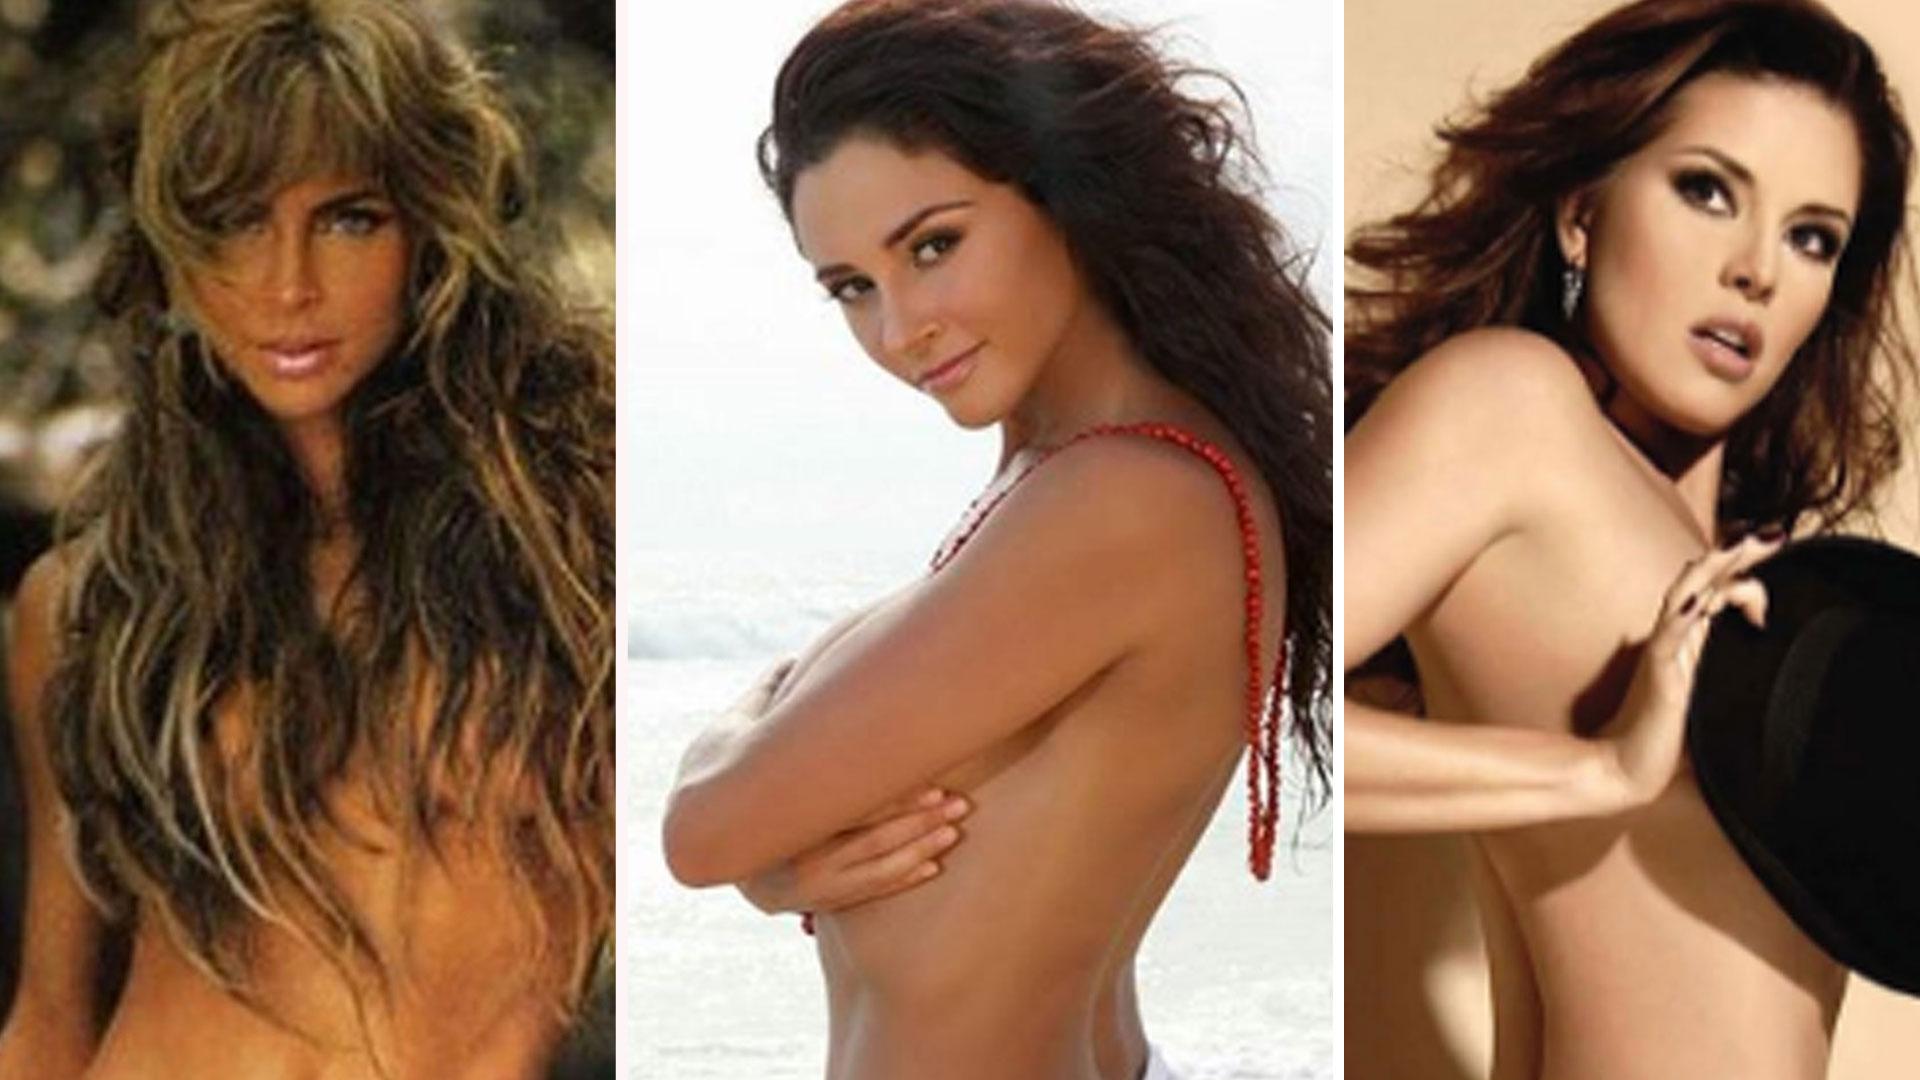 vintage porn stars girls nude